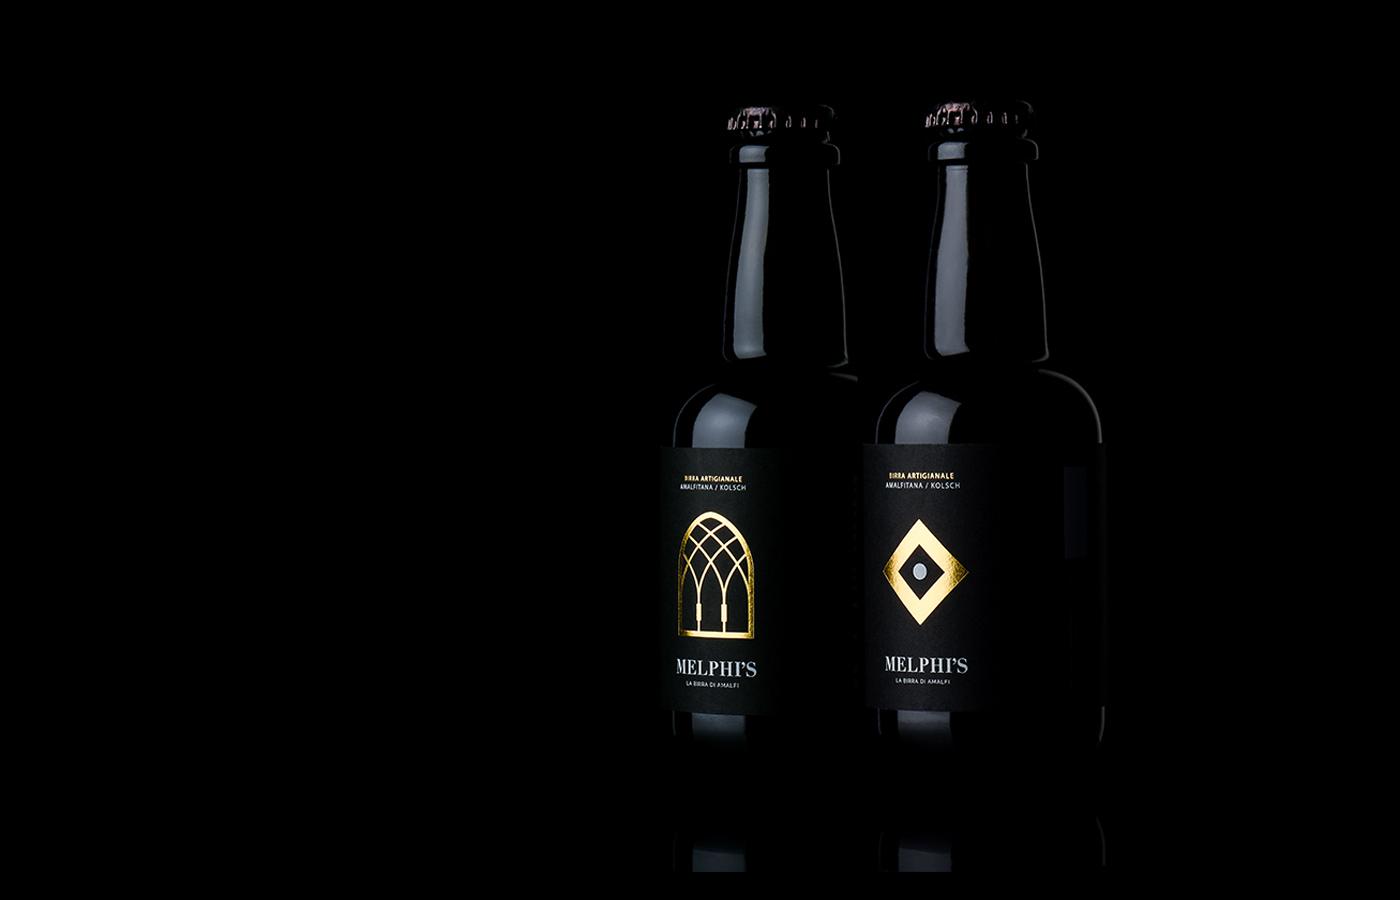 Agency Design – Melphi's Authentic Beer of Amalfi